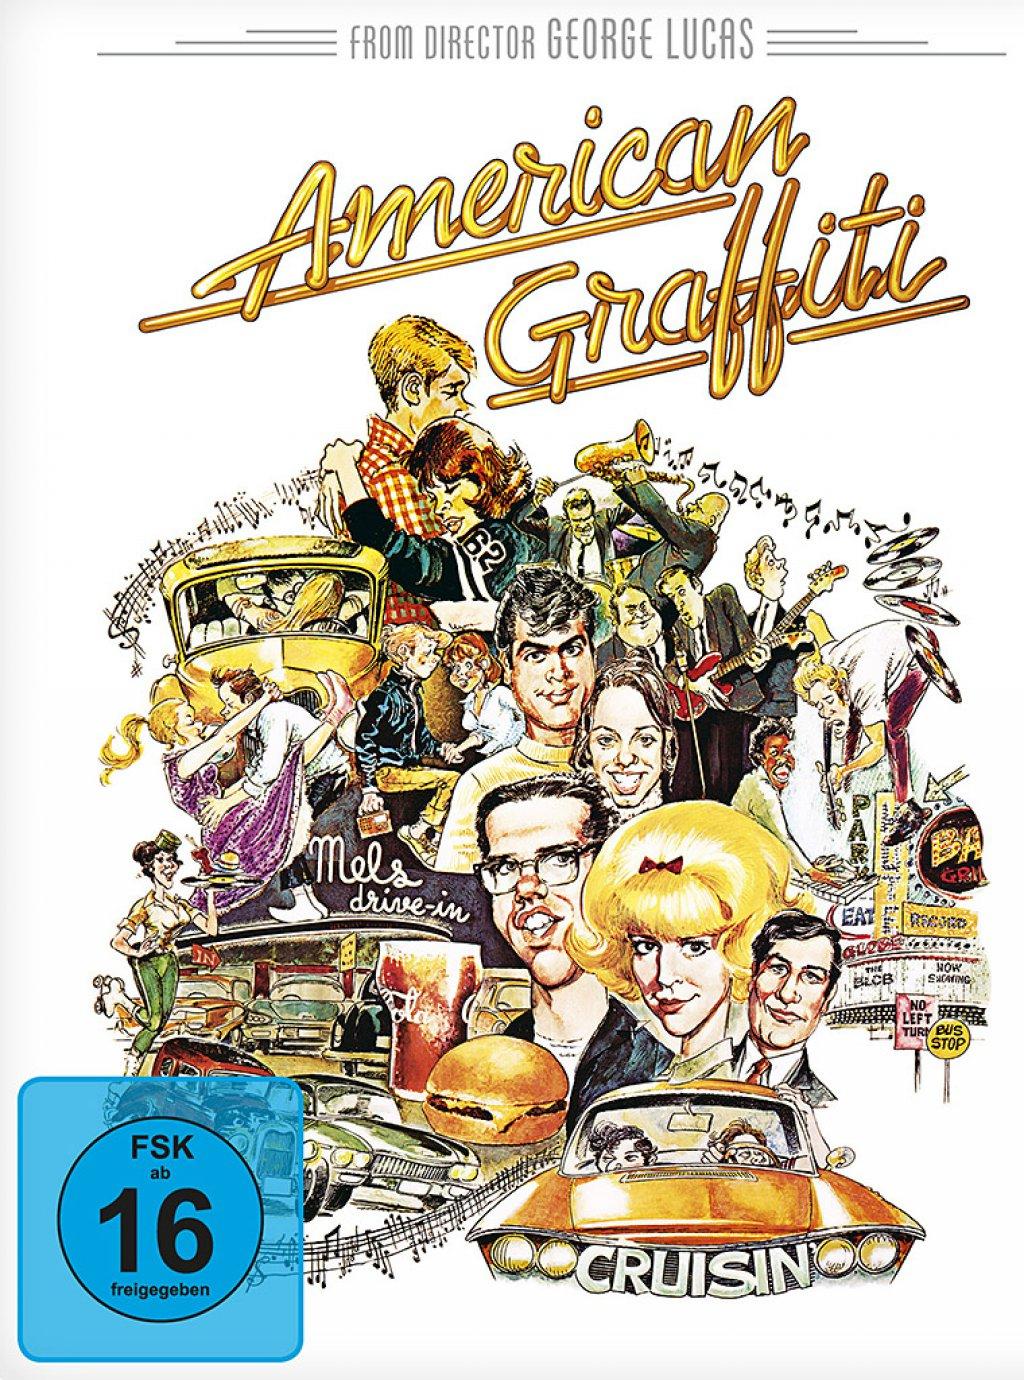 [Media-Dealer] American Graffiti - Limited Steelbook Edition (Blu-ray) für 7,99€ inc. Versand